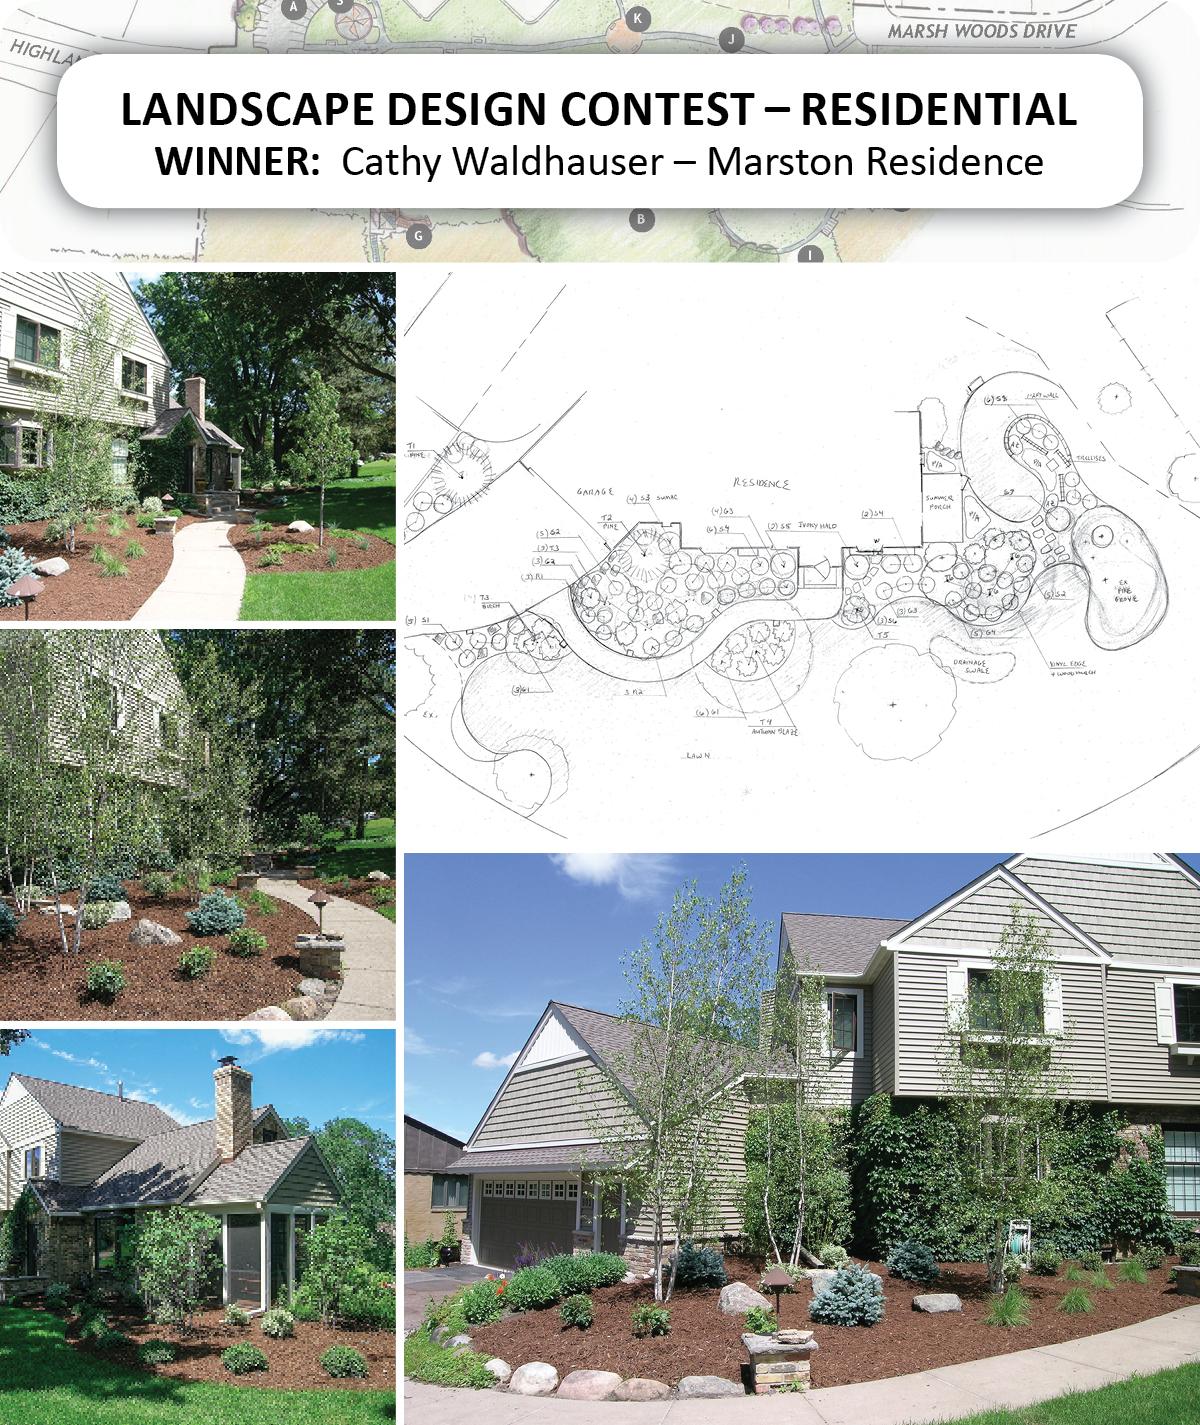 Landscape design competition for Landscape design competition